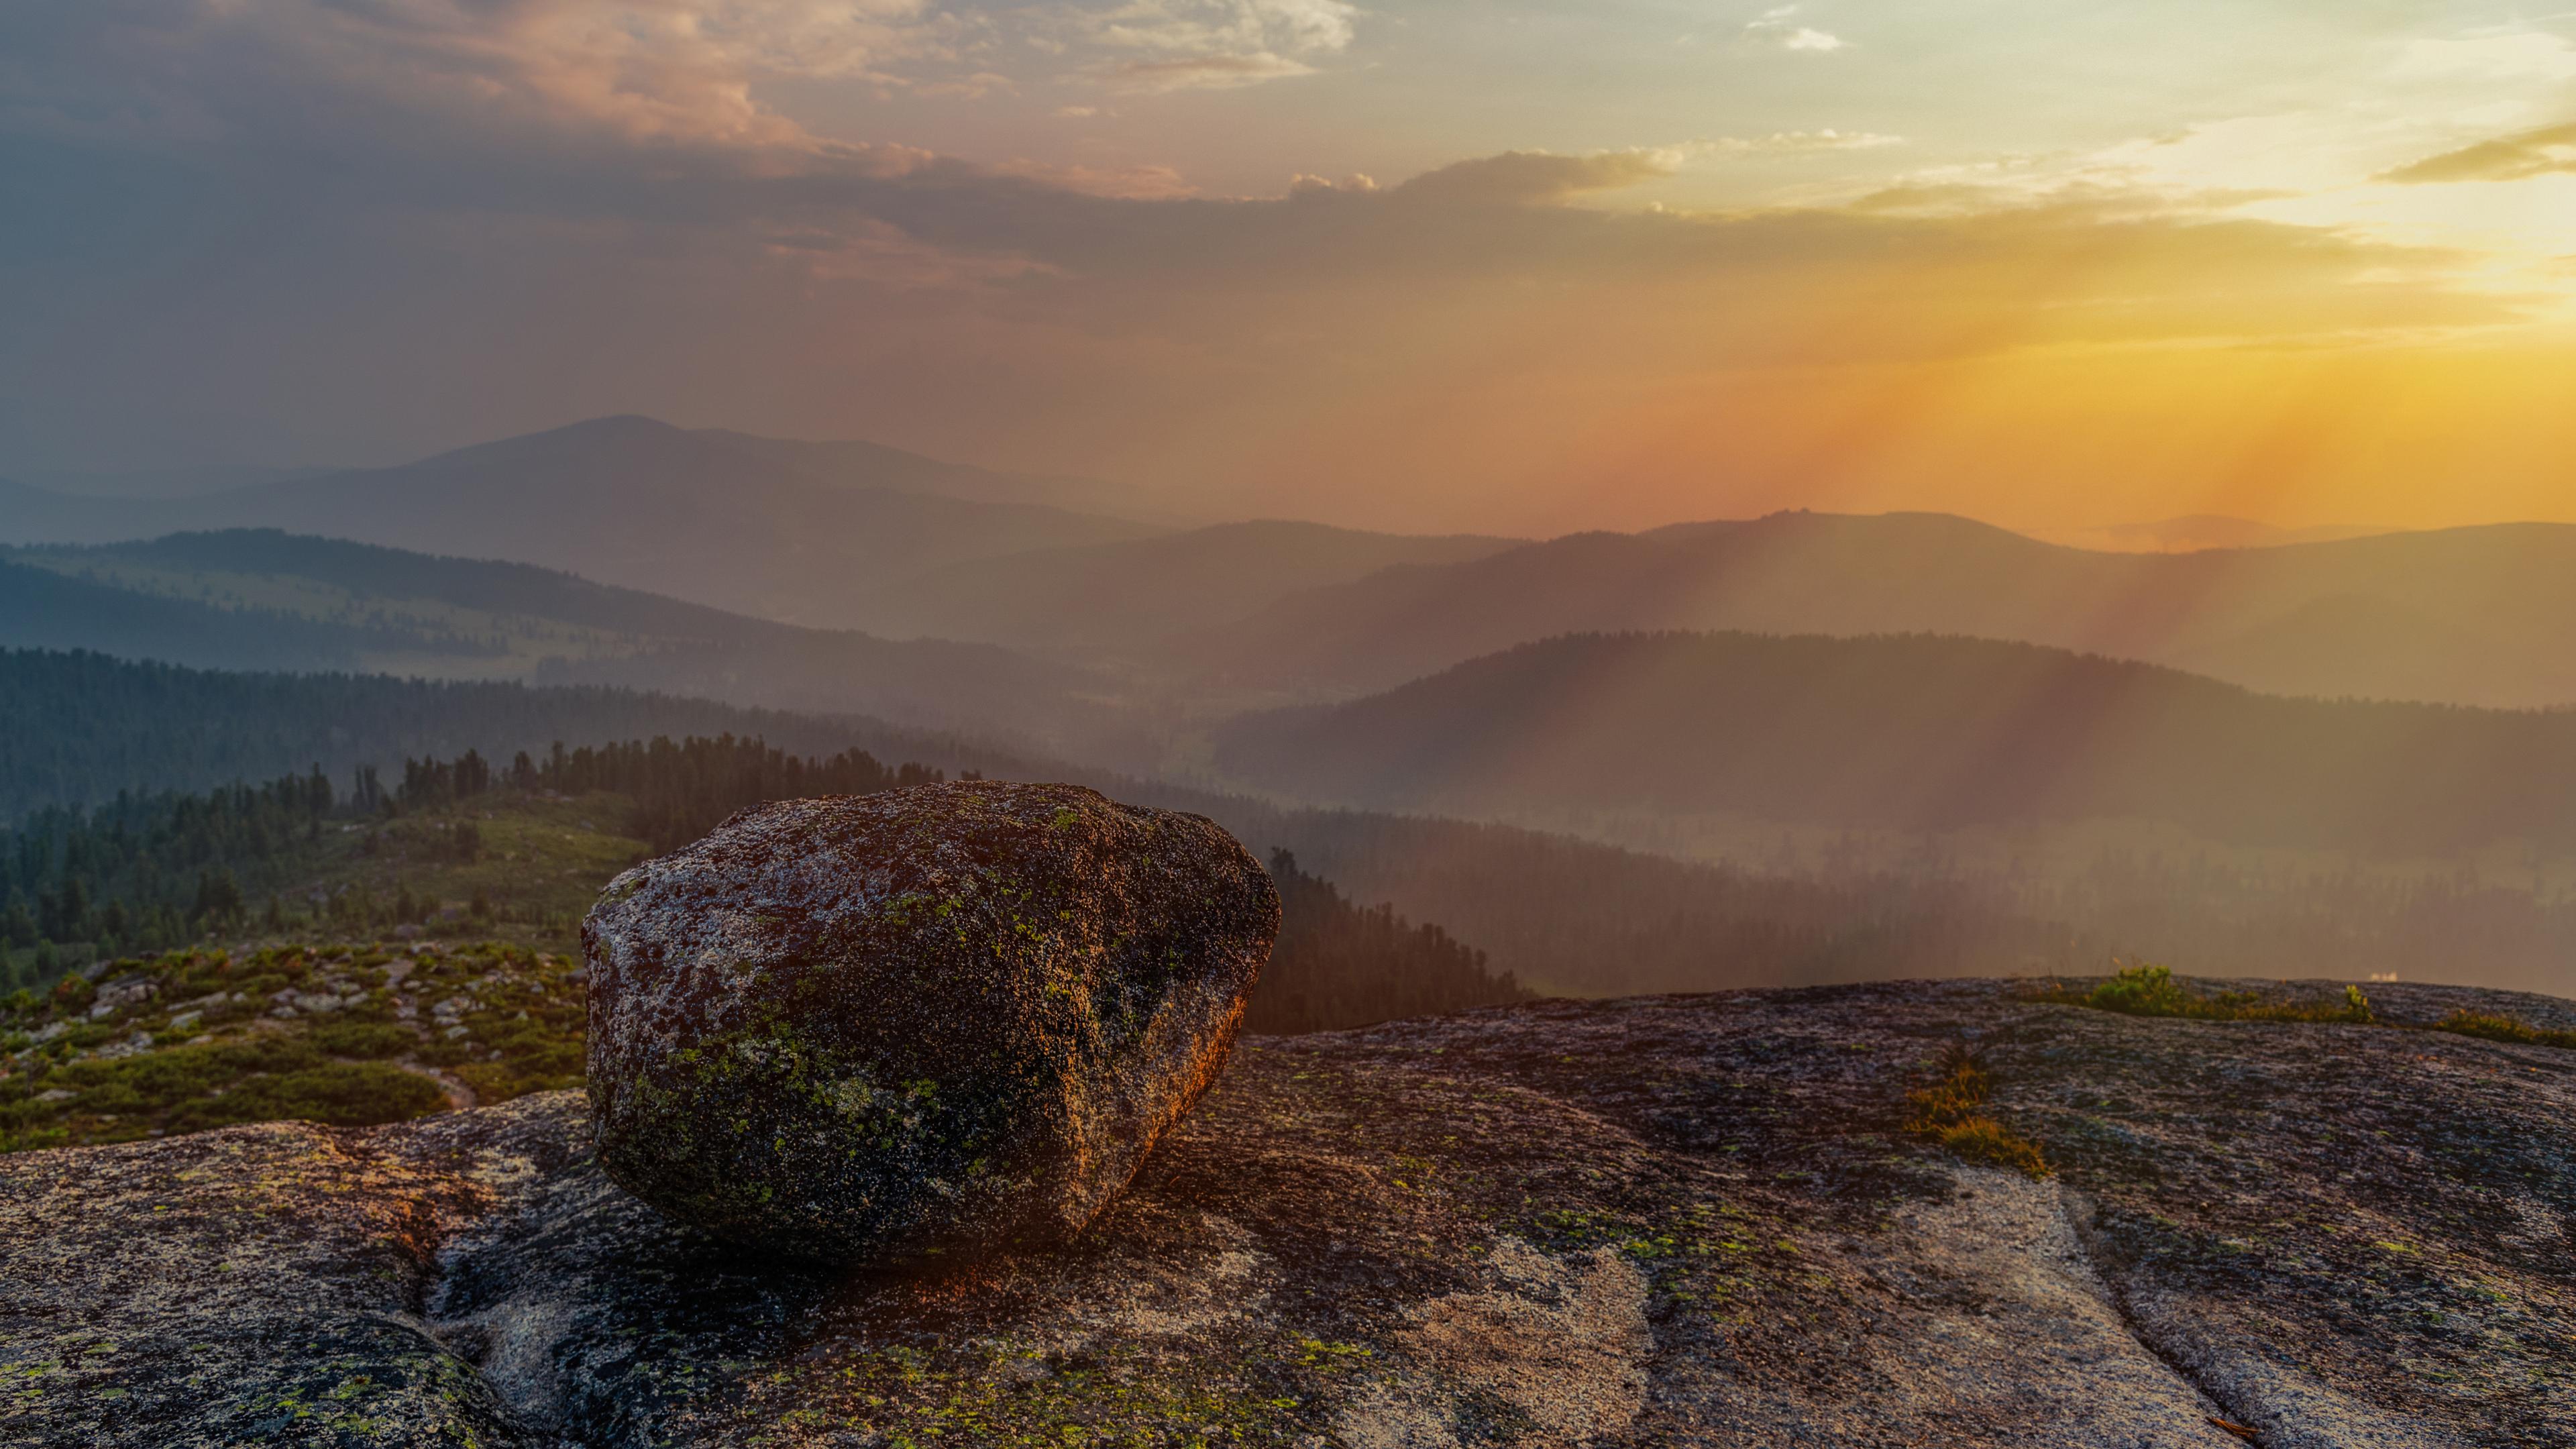 rock landscape mountain sunset sky 4k 1540144798 - Rock Landscape Mountain Sunset Sky 4k - sunset wallpapers, sky wallpapers, rock wallpapers, nature wallpapers, mountain wallpapers, landscape wallpapers, hd-wallpapers, 5k wallpapers, 4k-wallpapers